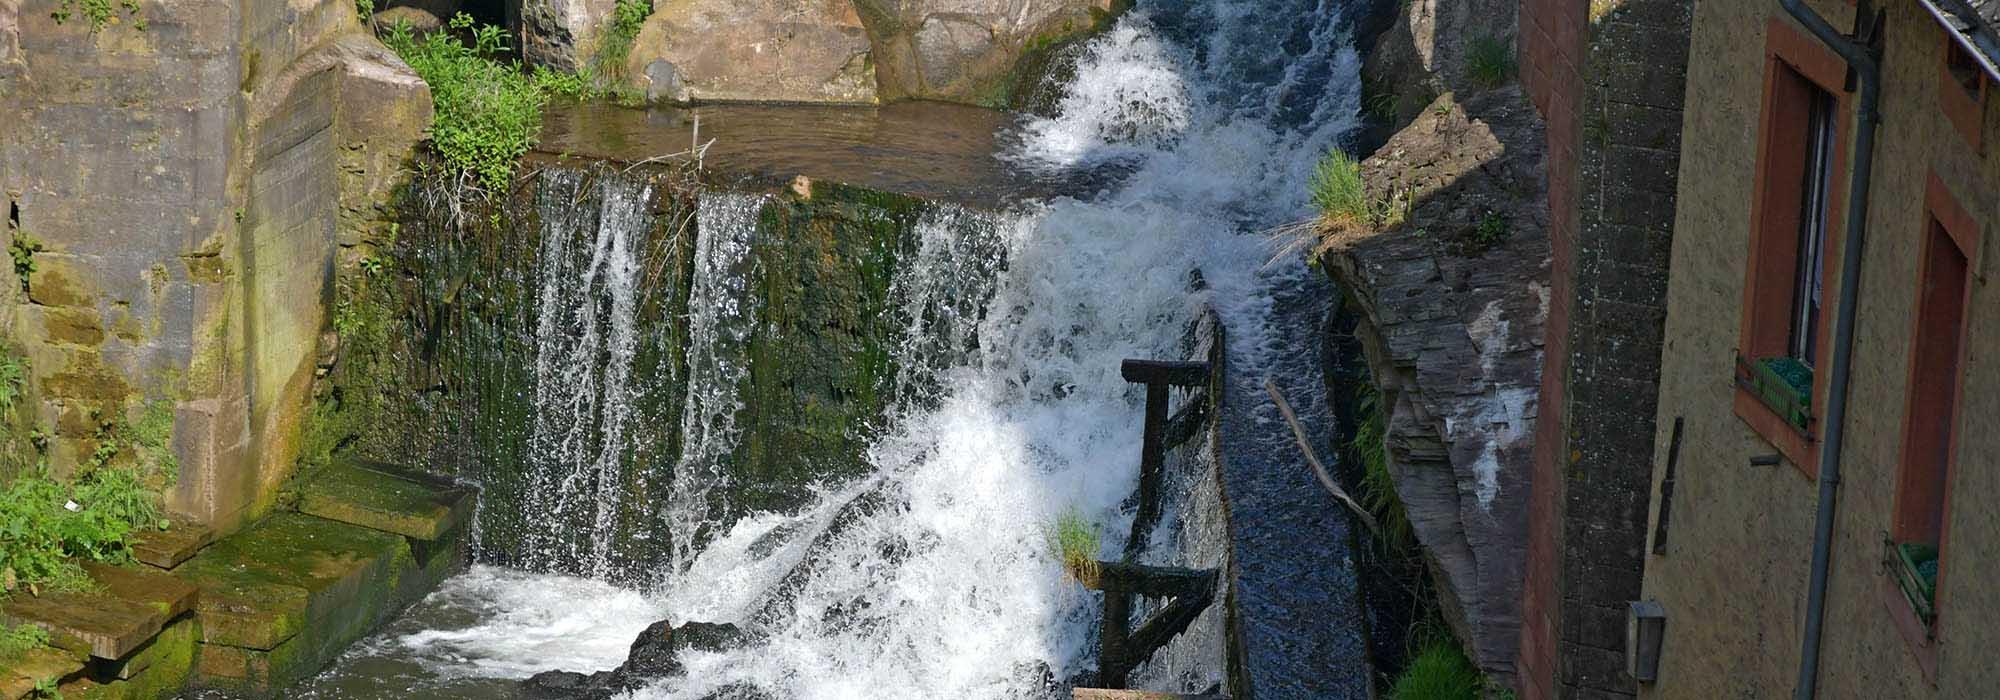 ARN_0456_Saarburg_Wasserfall